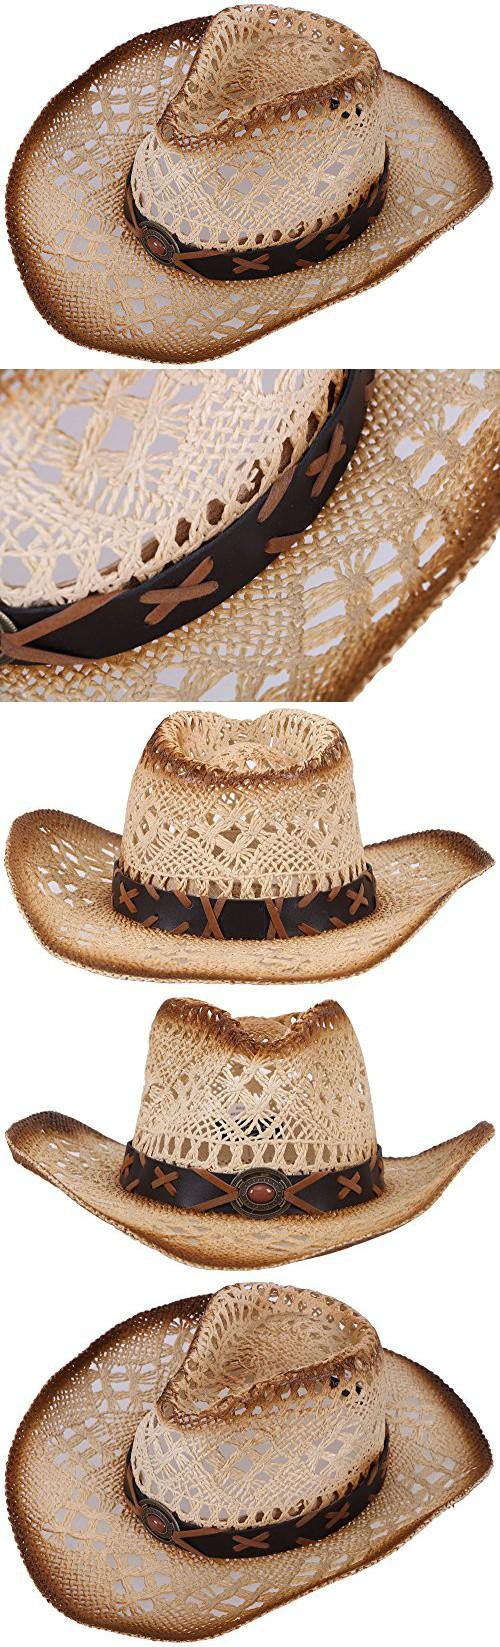 c0573ea91ec Simplicity Western Men   Women Cowboy Straw Hat Natural Brown Bead ...